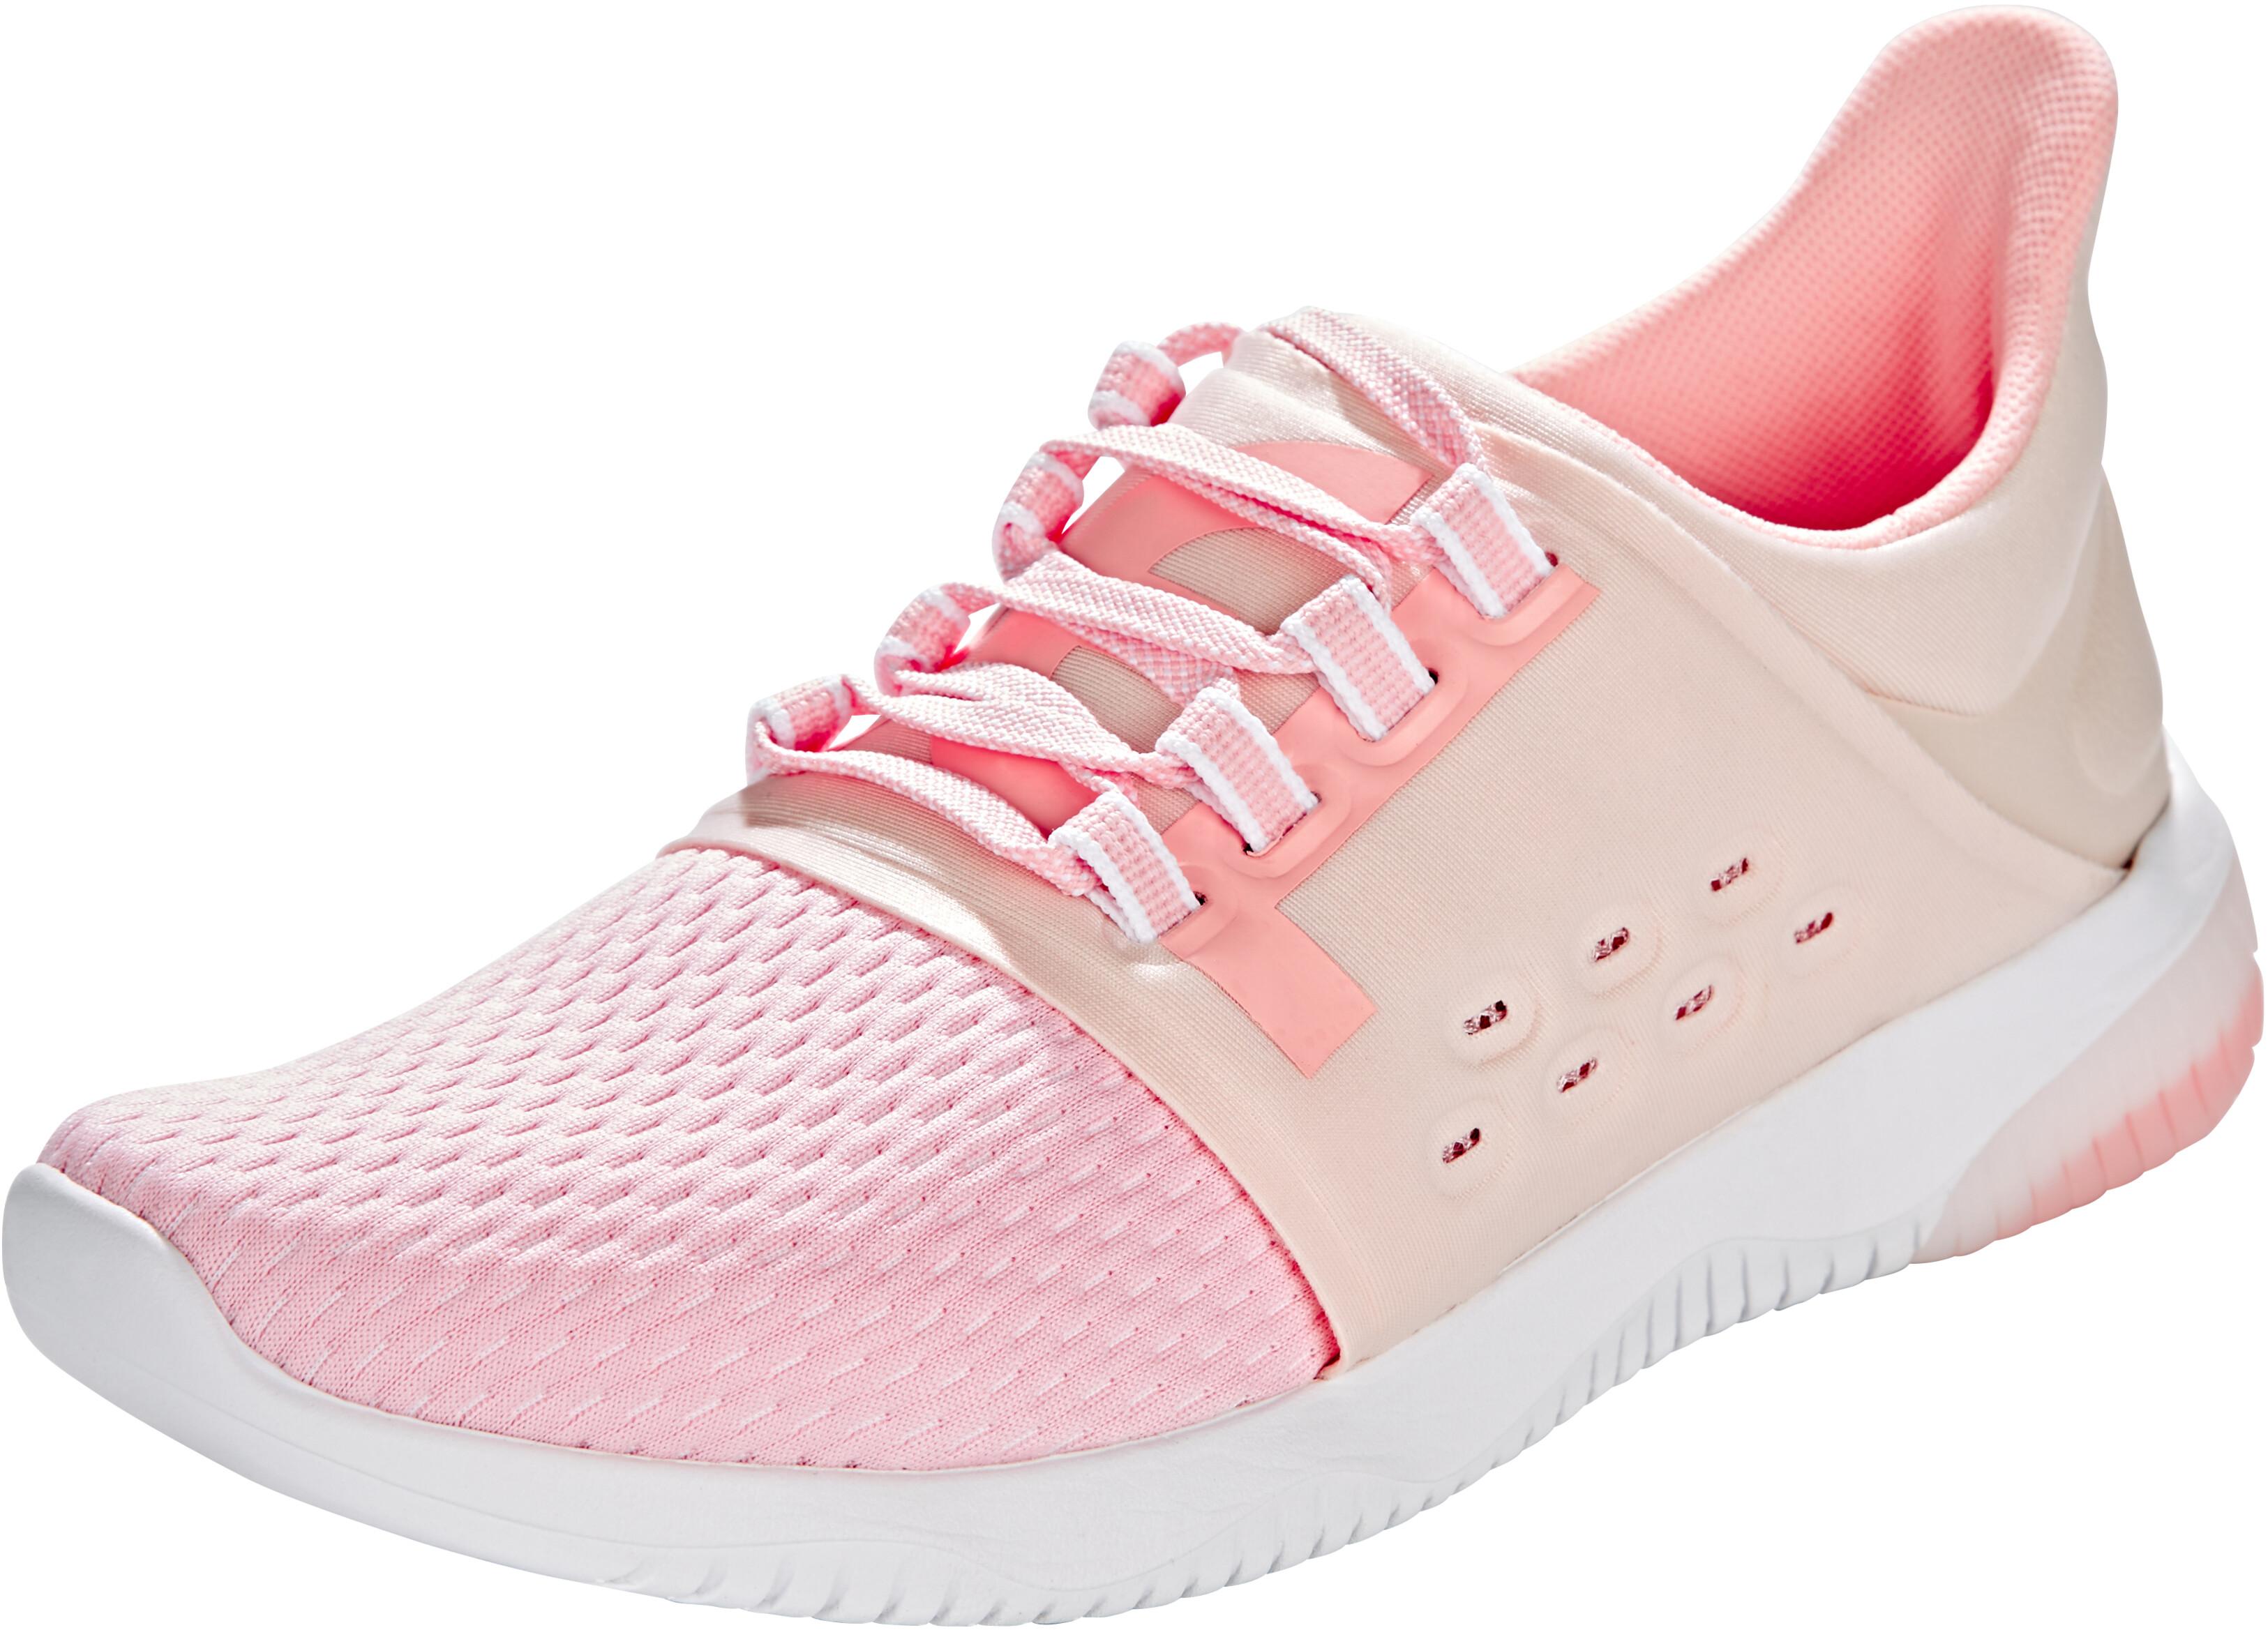 sneakers for cheap 15ef4 916b3 asics Gel-Kenun Lyte Running Shoes Women beige pink